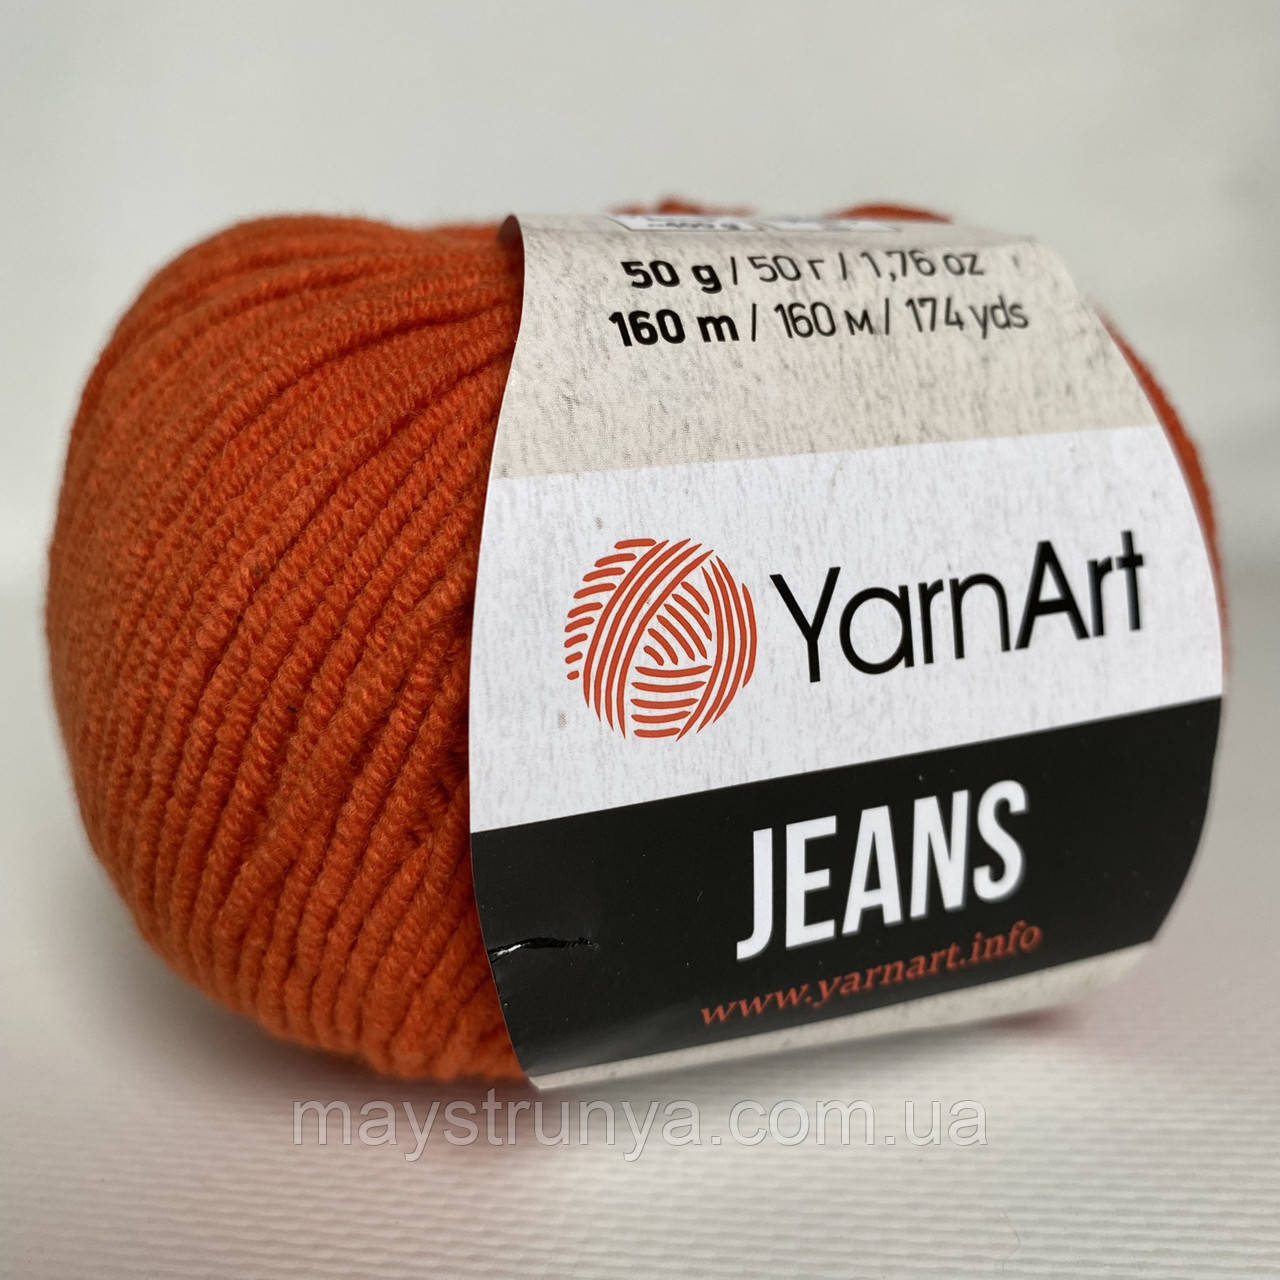 YarnArt Jeans (ярнарт джинс) 85 Кирпичный